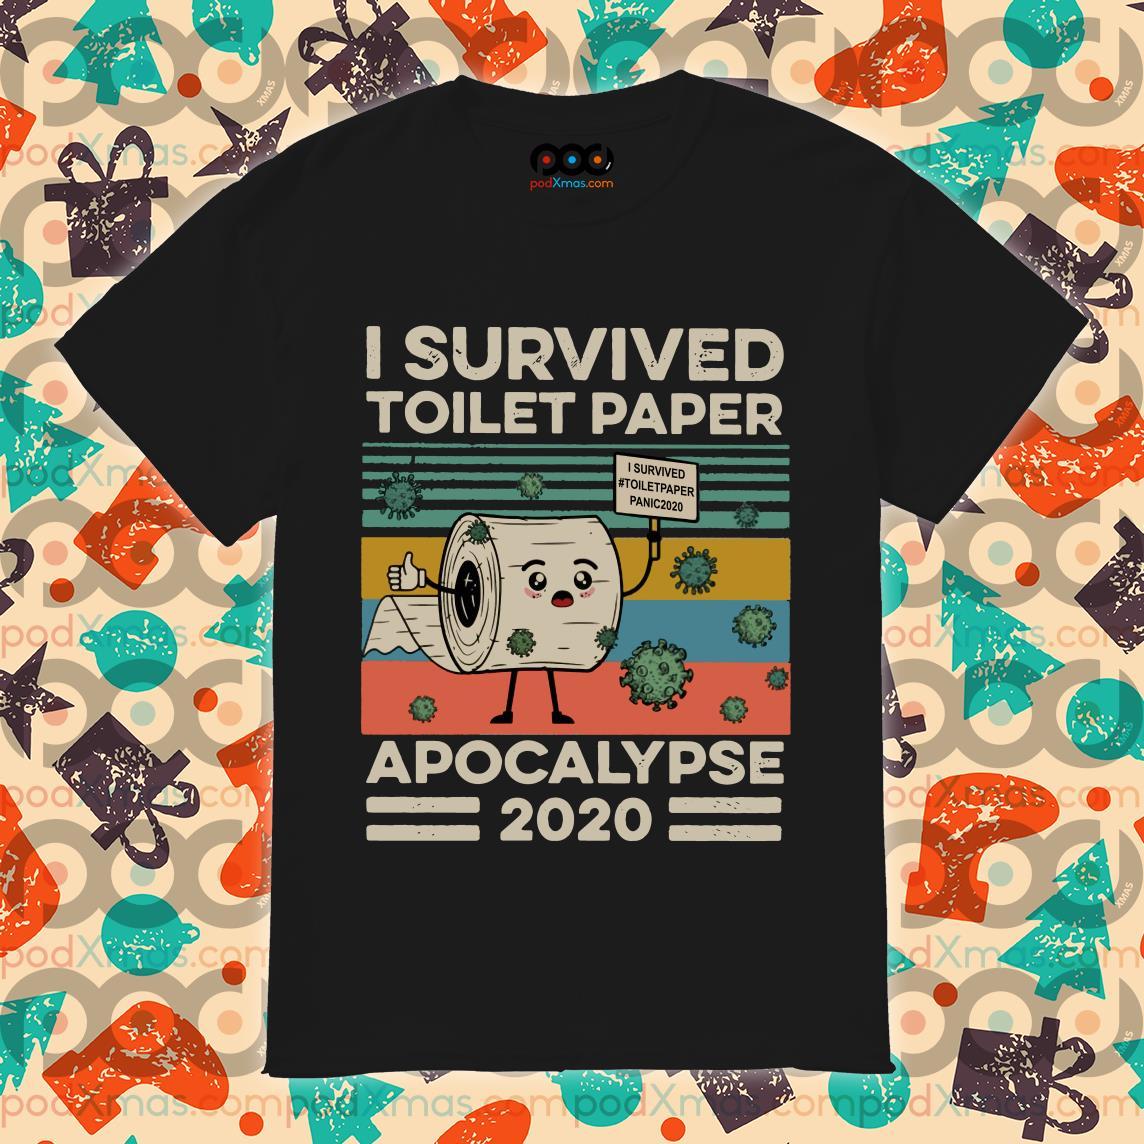 I survived toilet paper apocalypse 2020 Coronavirus shirt